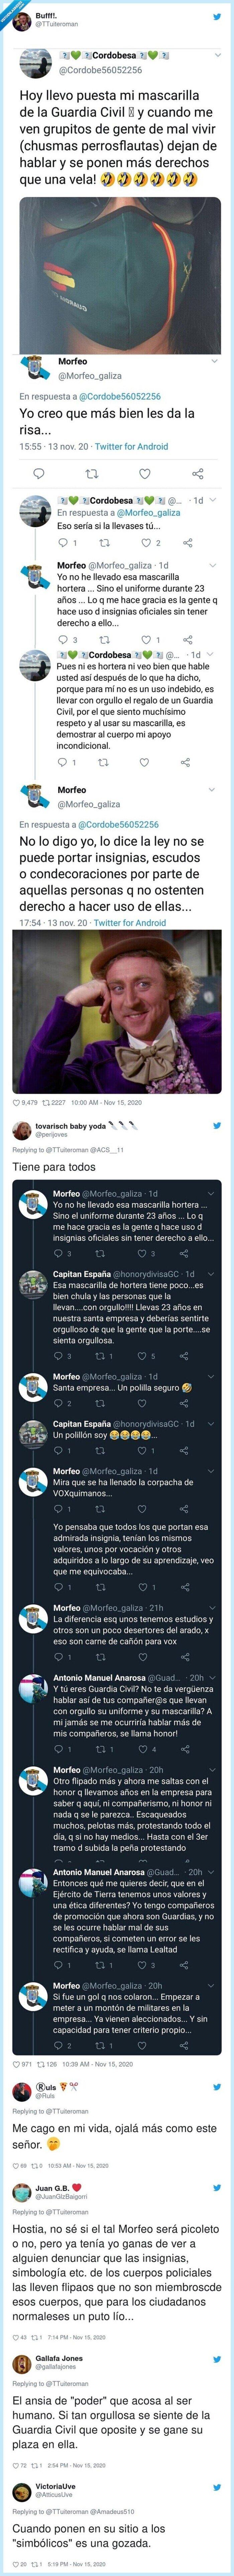 guardiacivil,insignia,mascarilla,policía,twitter,zasca